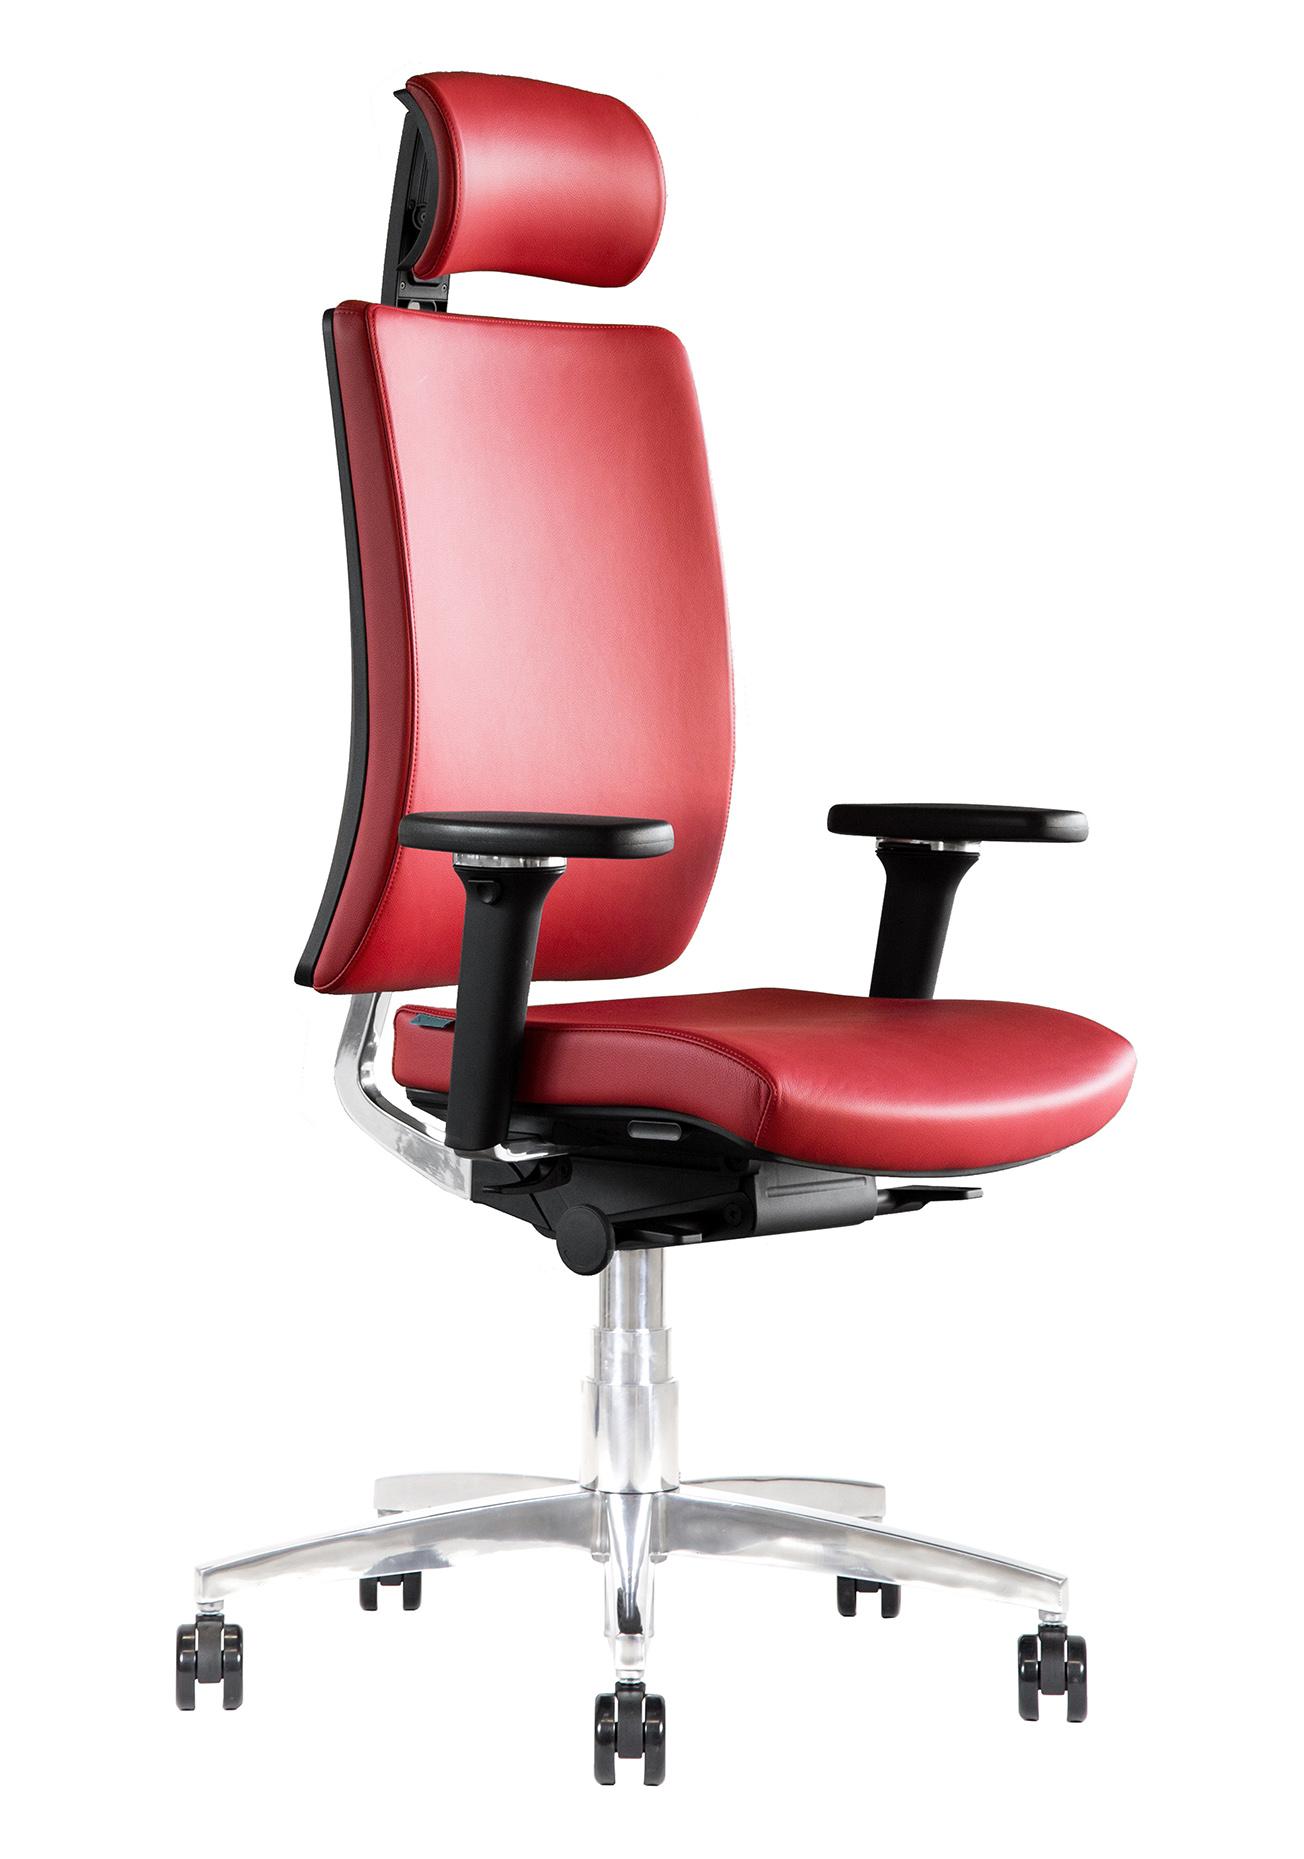 Bb200 sedie e sedute per ufficio direzionali ergonomiche - Sedie per ufficio ergonomiche ...